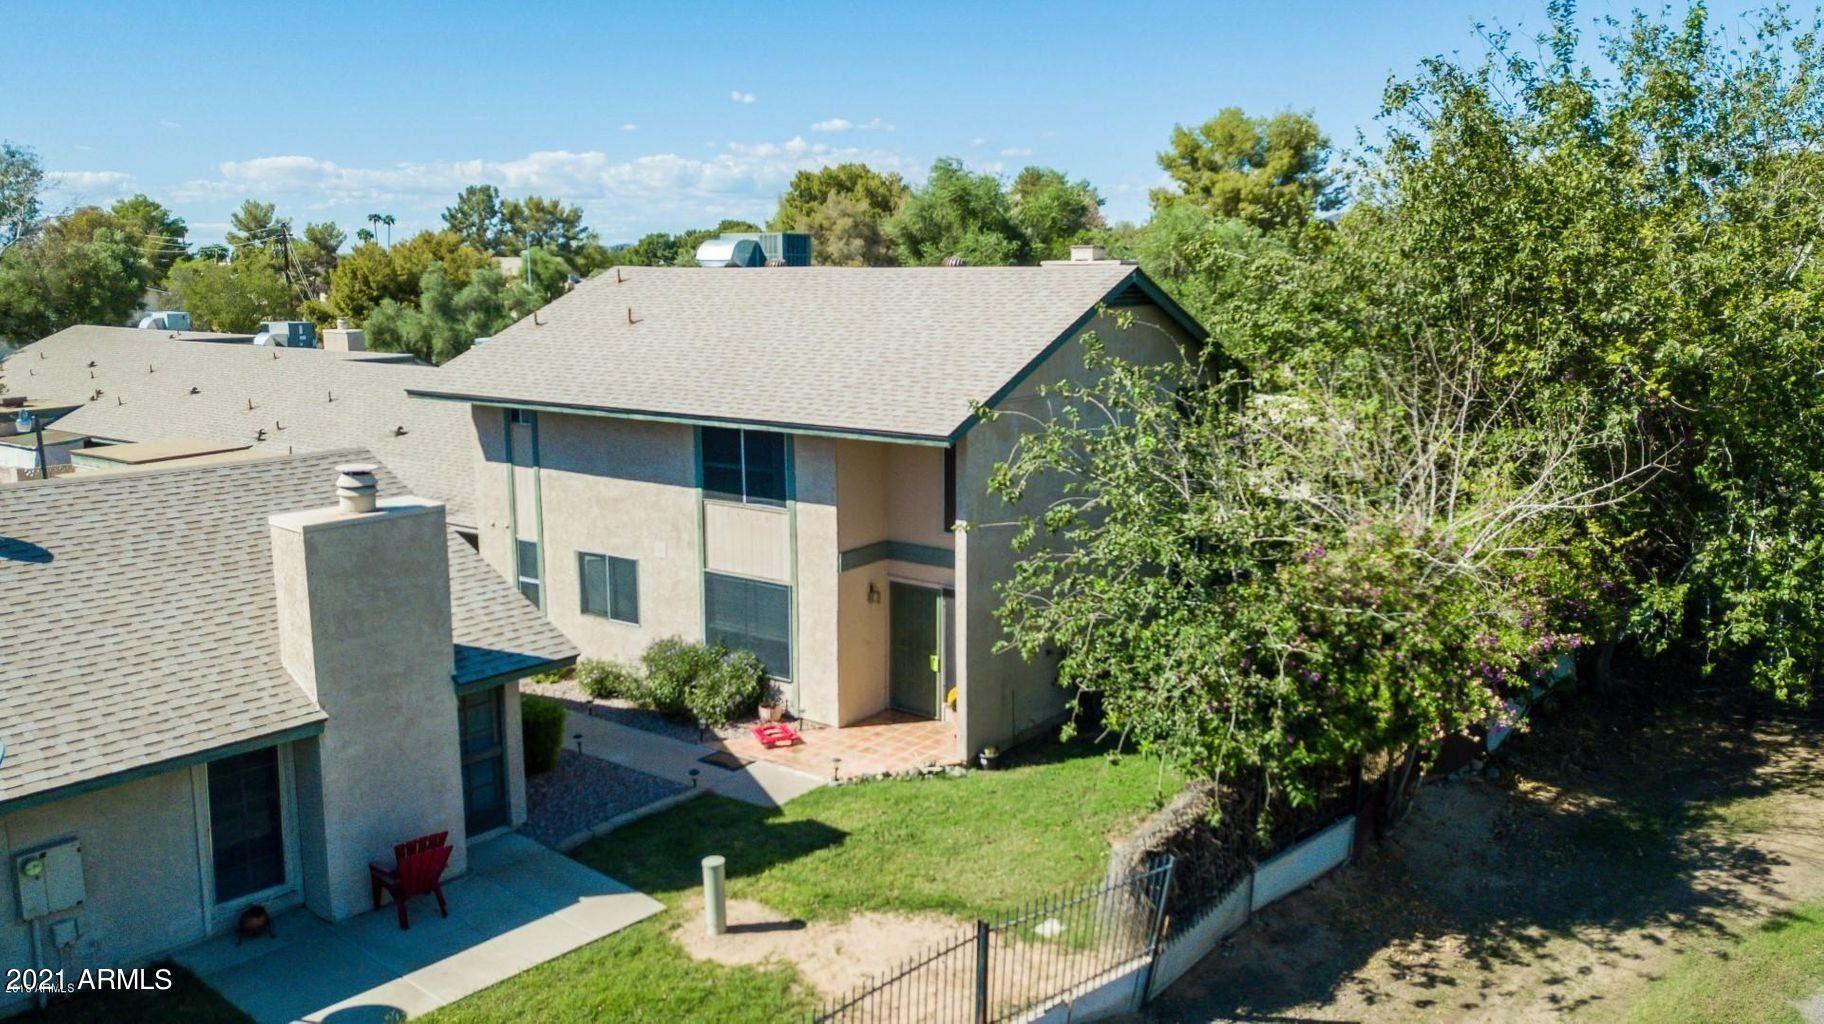 Photo of 17639 N 45TH Avenue, Glendale, AZ 85308 (MLS # 6233584)